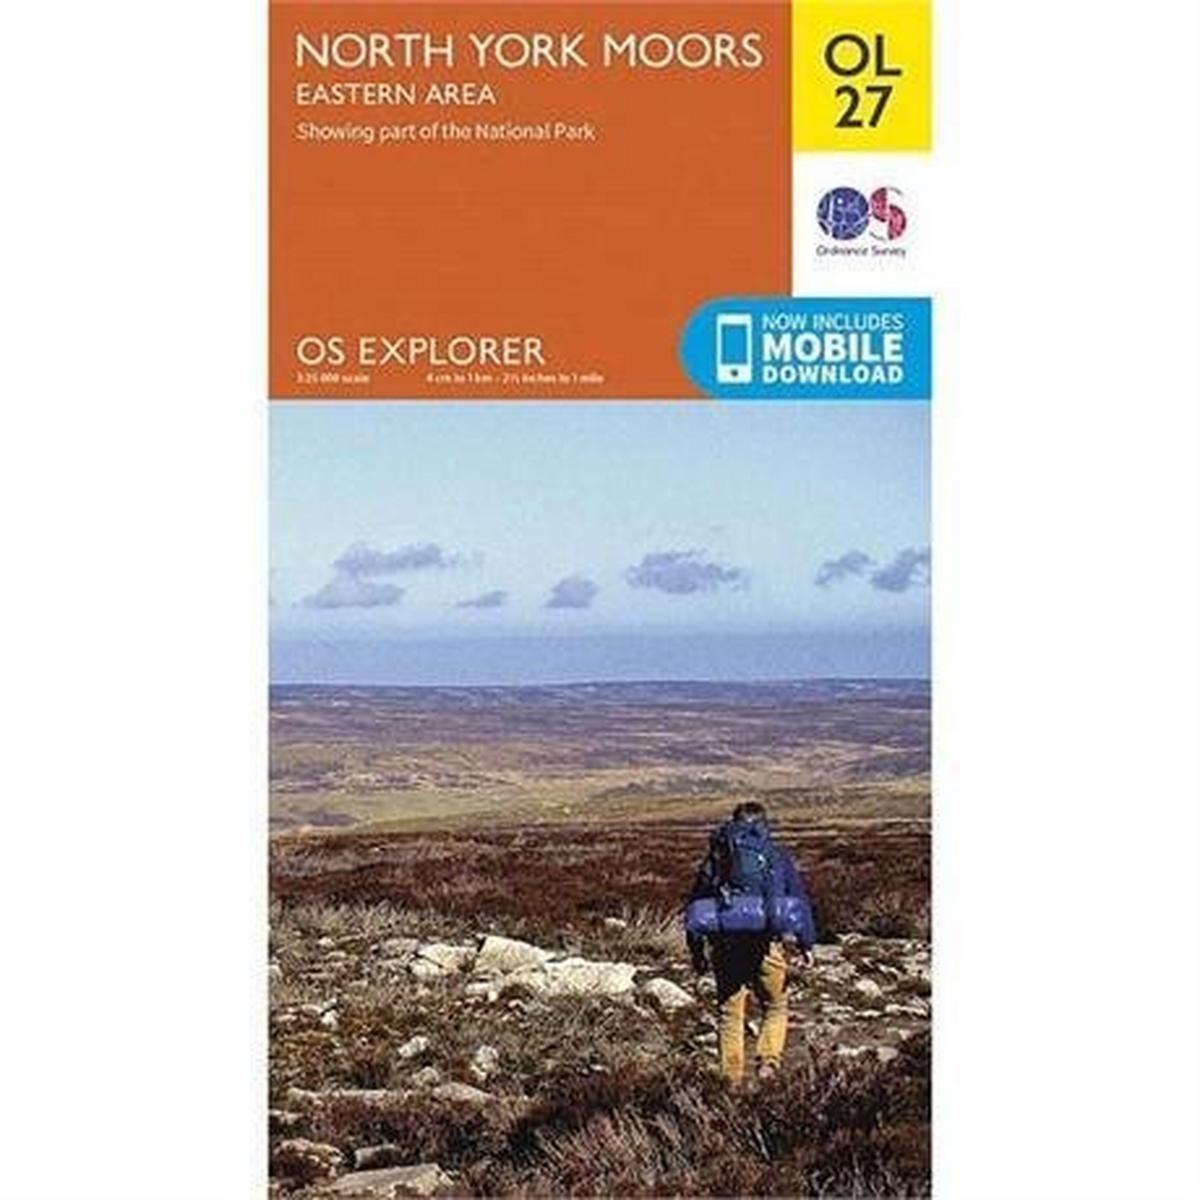 Ordnance Survey OS Explorer Map OL27 North York Moors - Eastern